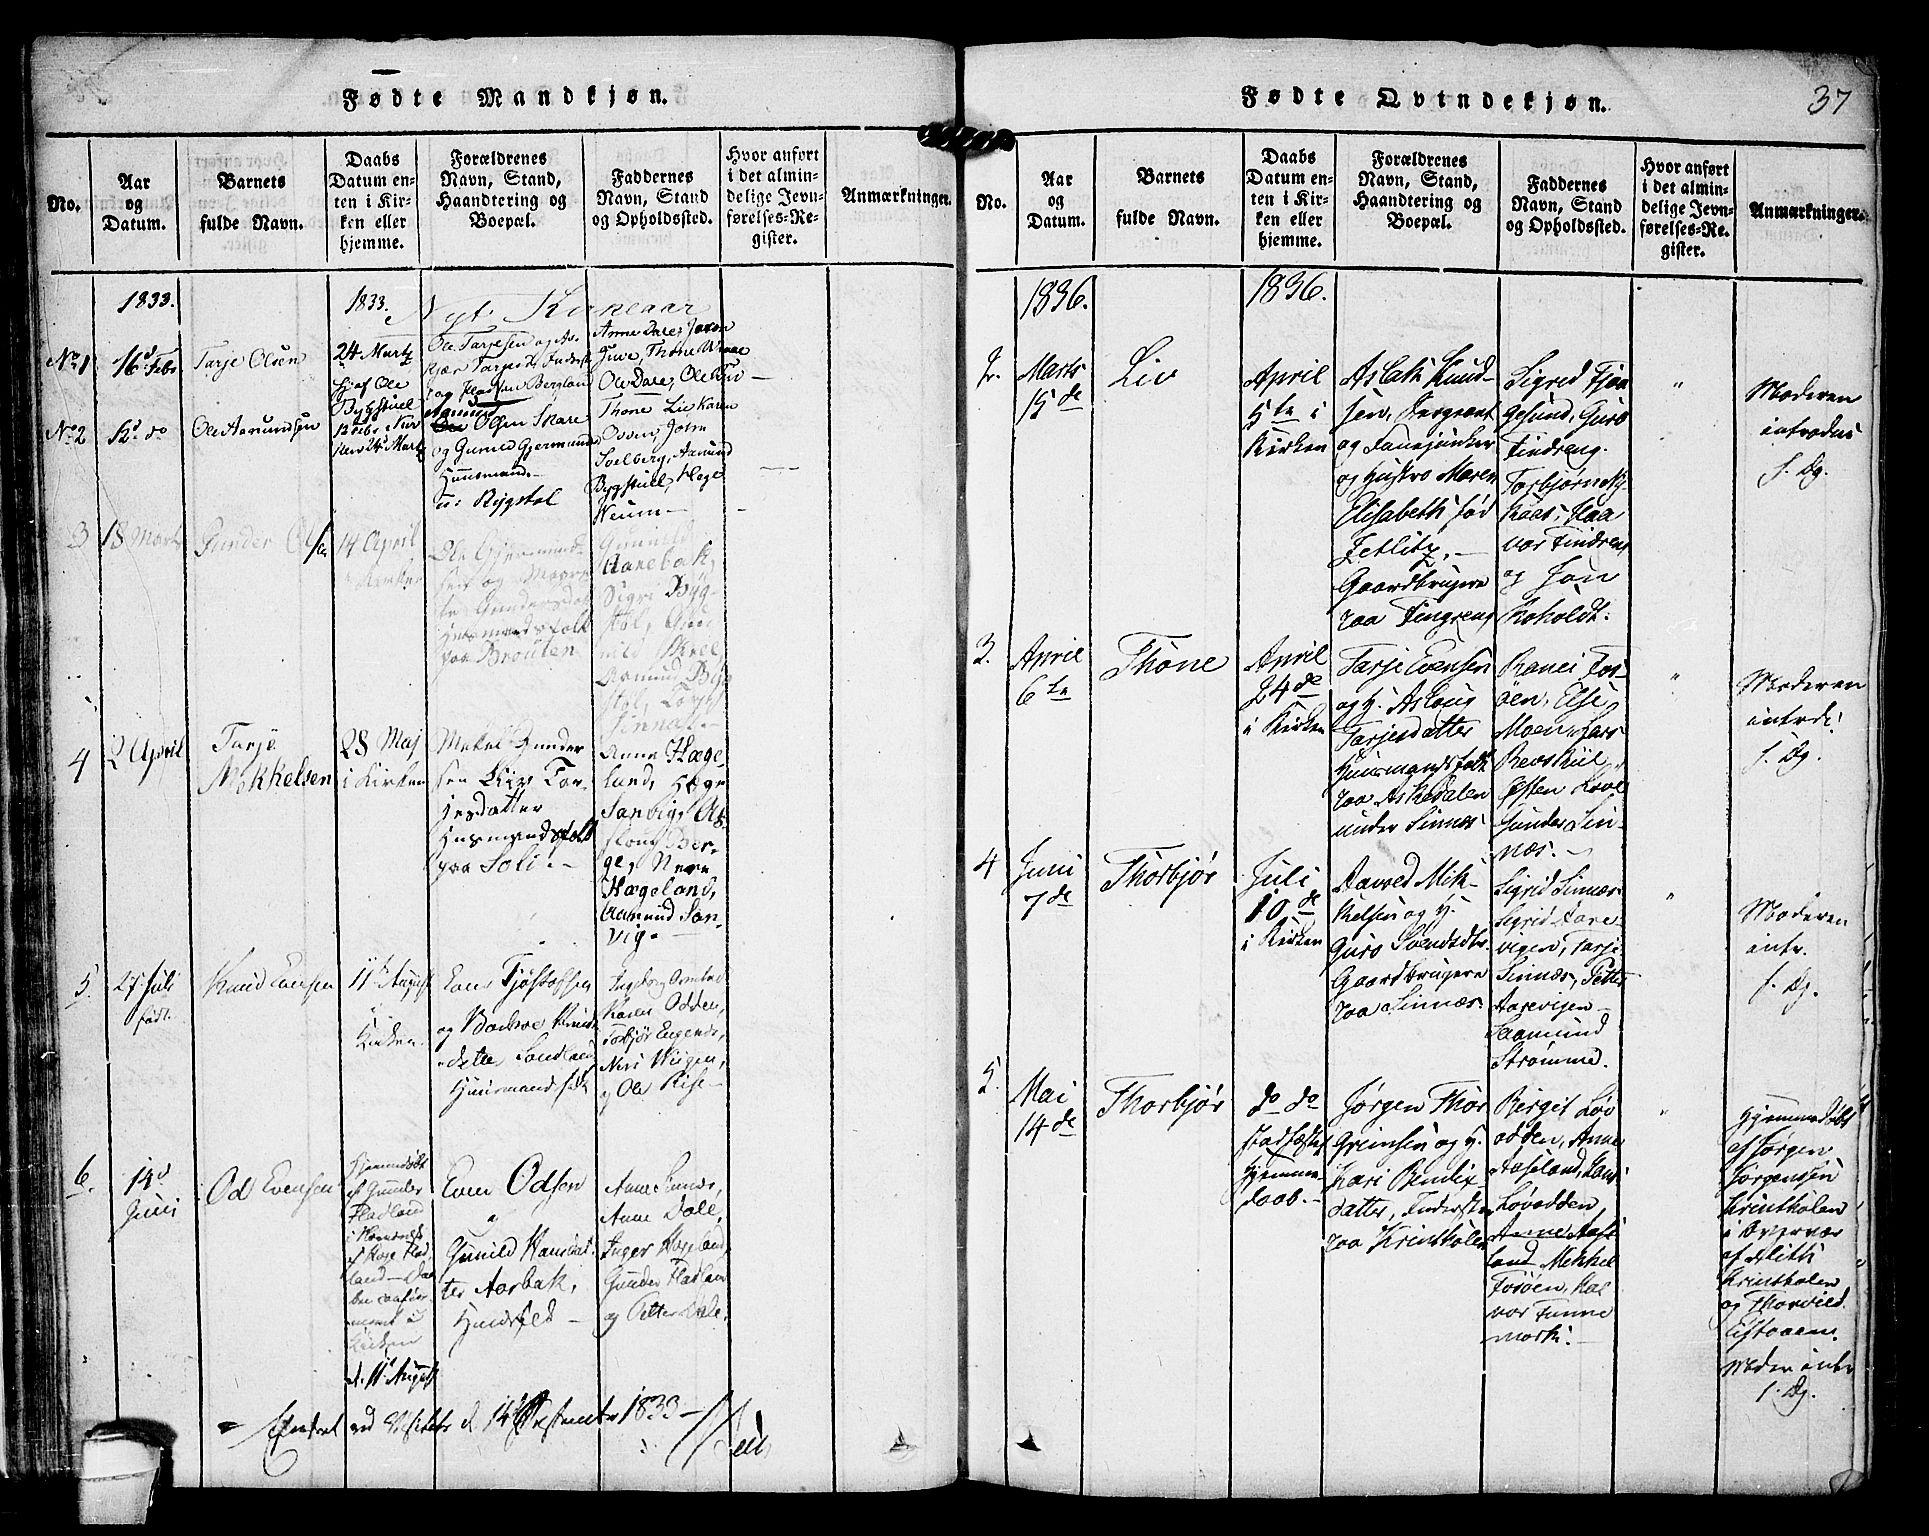 SAKO, Kviteseid kirkebøker, F/Fc/L0001: Ministerialbok nr. III 1, 1815-1836, s. 37